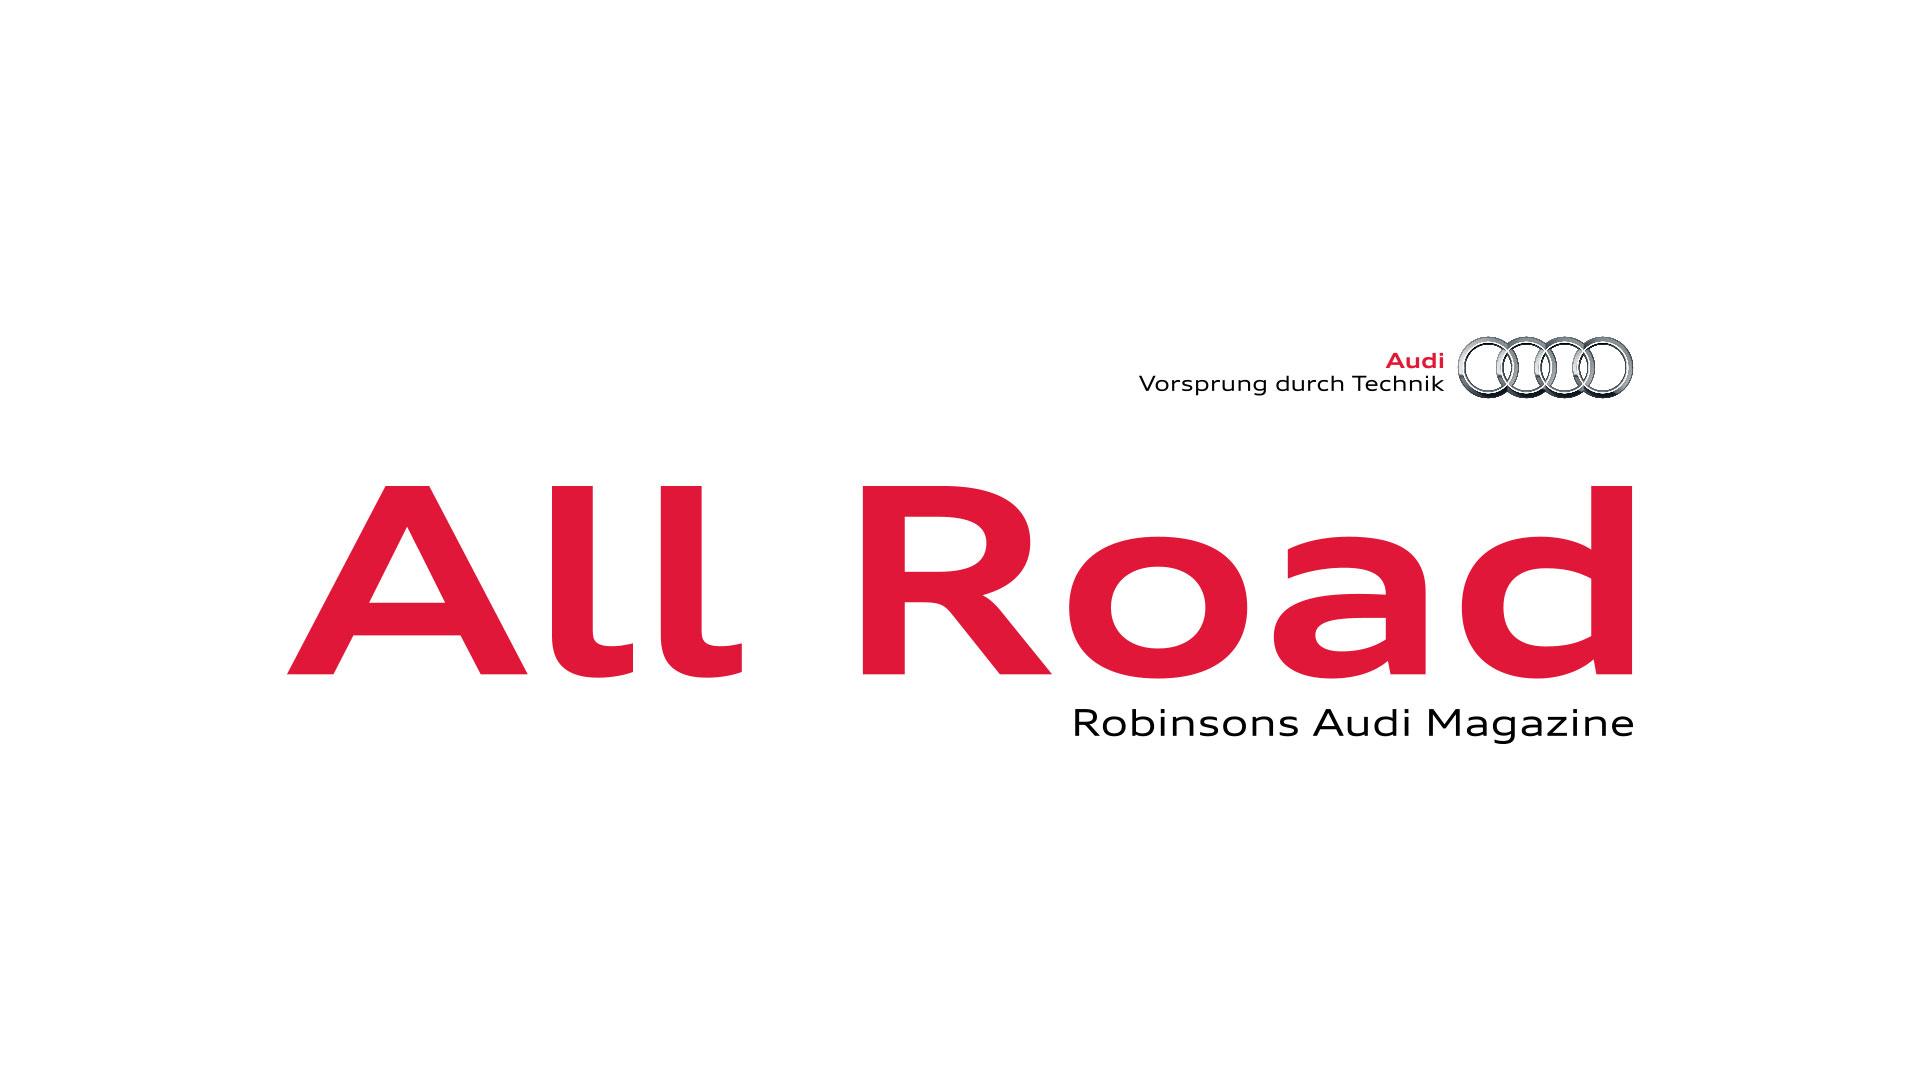 Robinsons Audi Magazine allroad logo print design